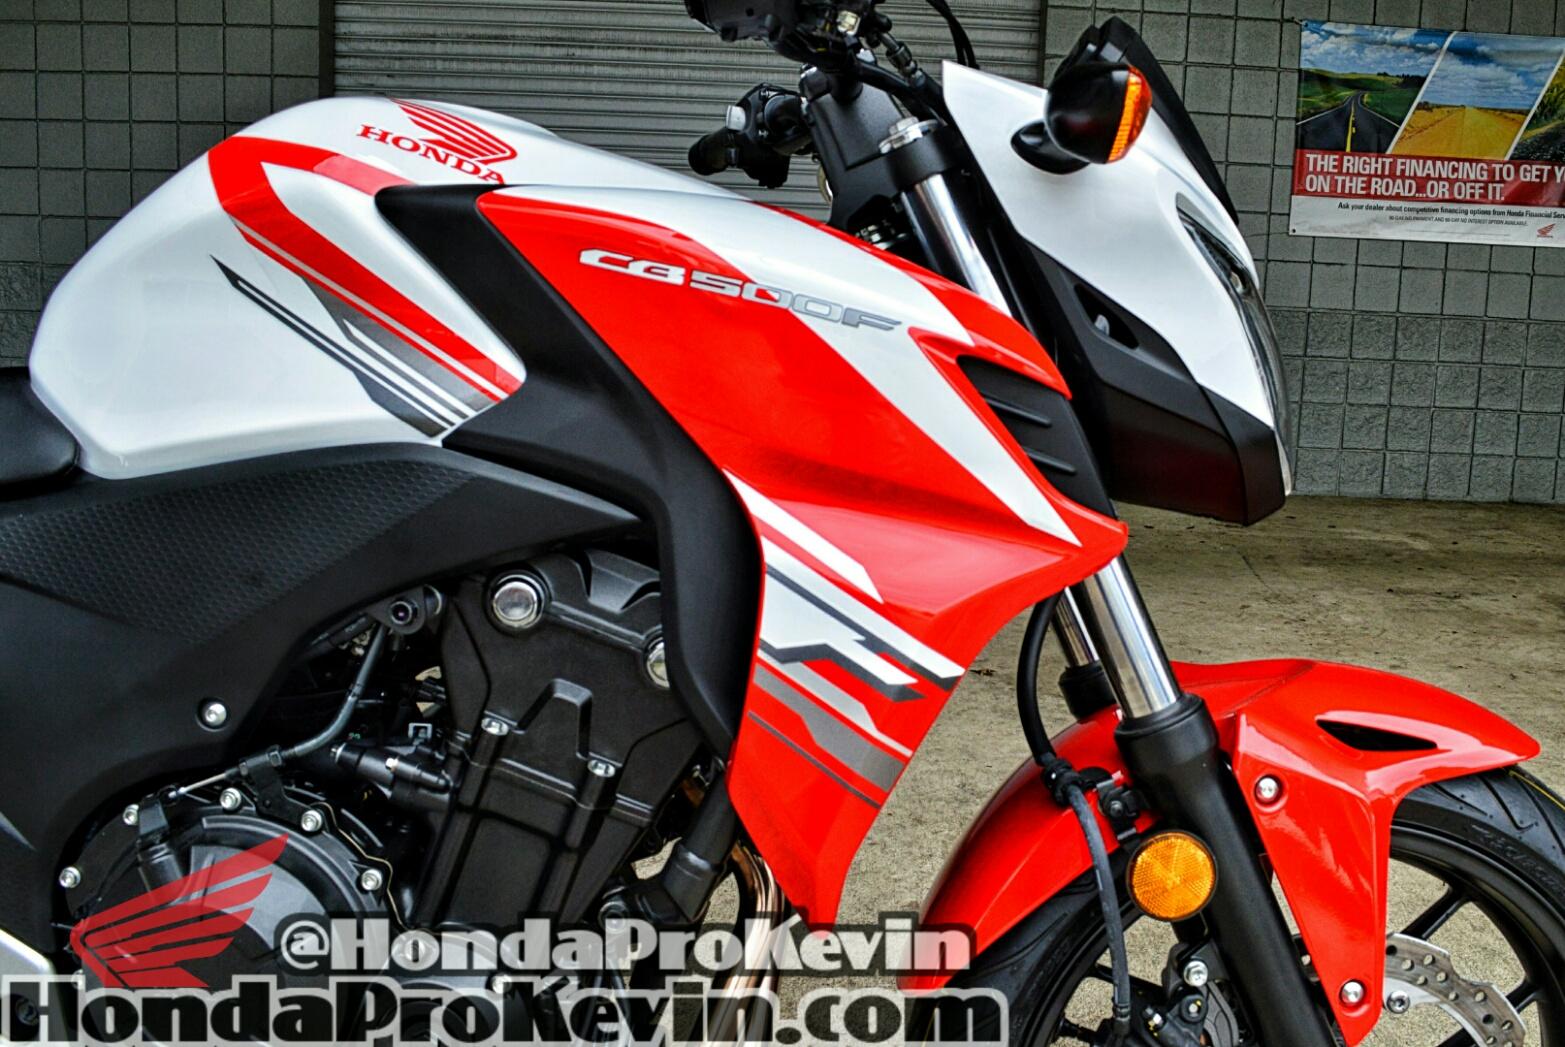 Honda Cbr500r Amp Cb500f Motorcycle Recall Stop Sale